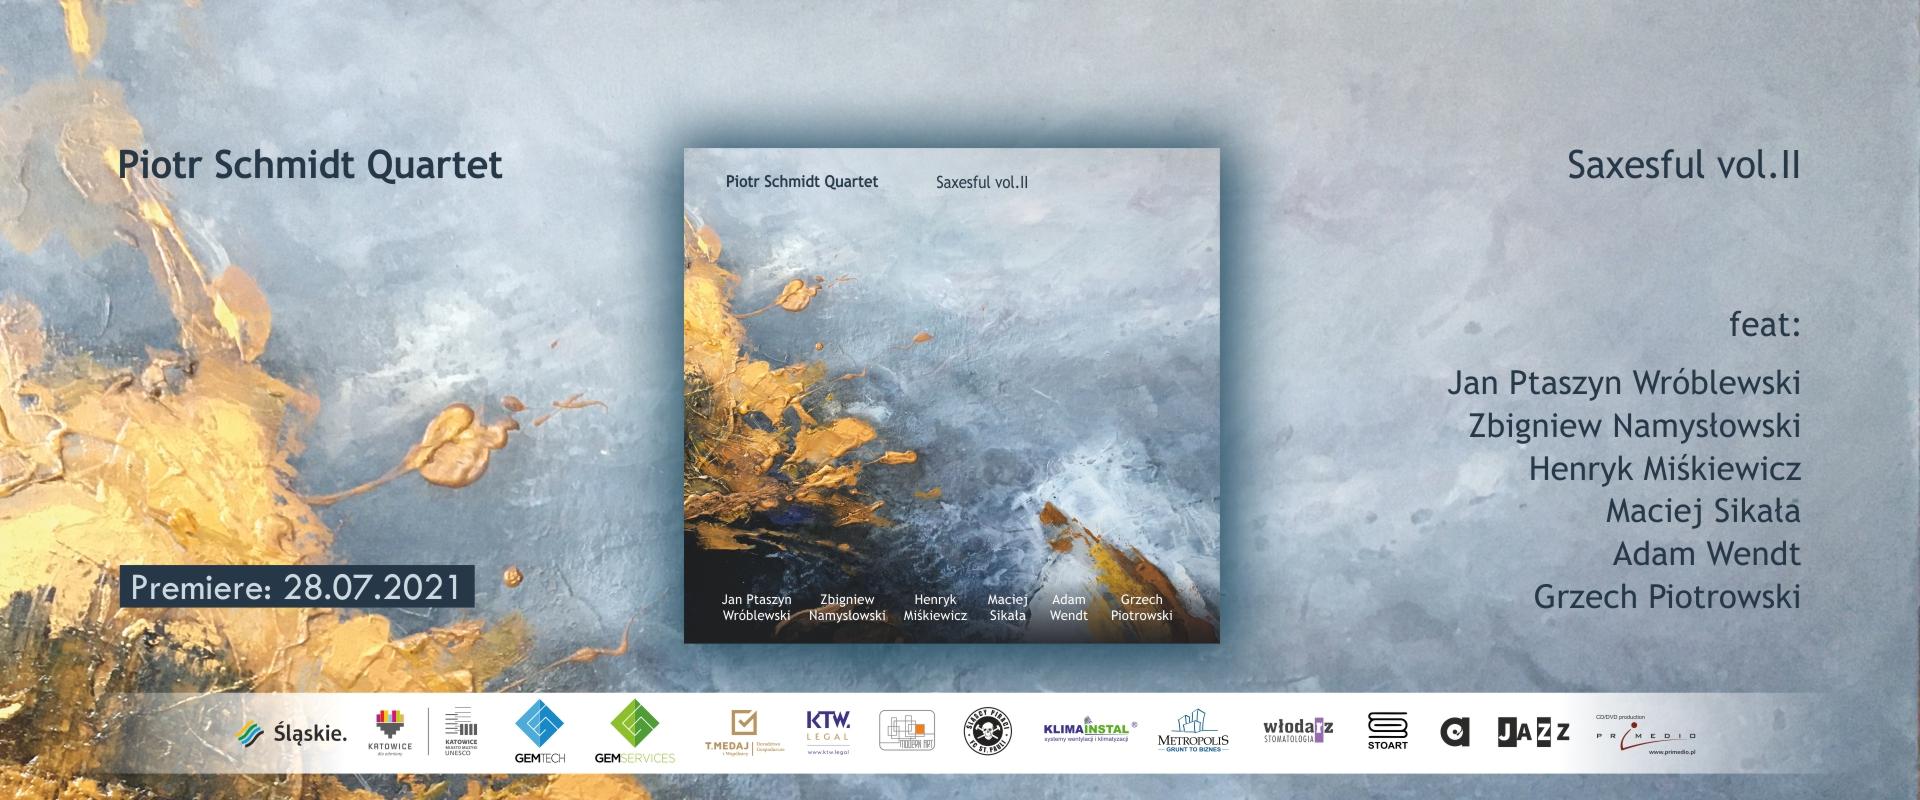 Piotr Schmidt Quartet - Saxesful vol. II alt